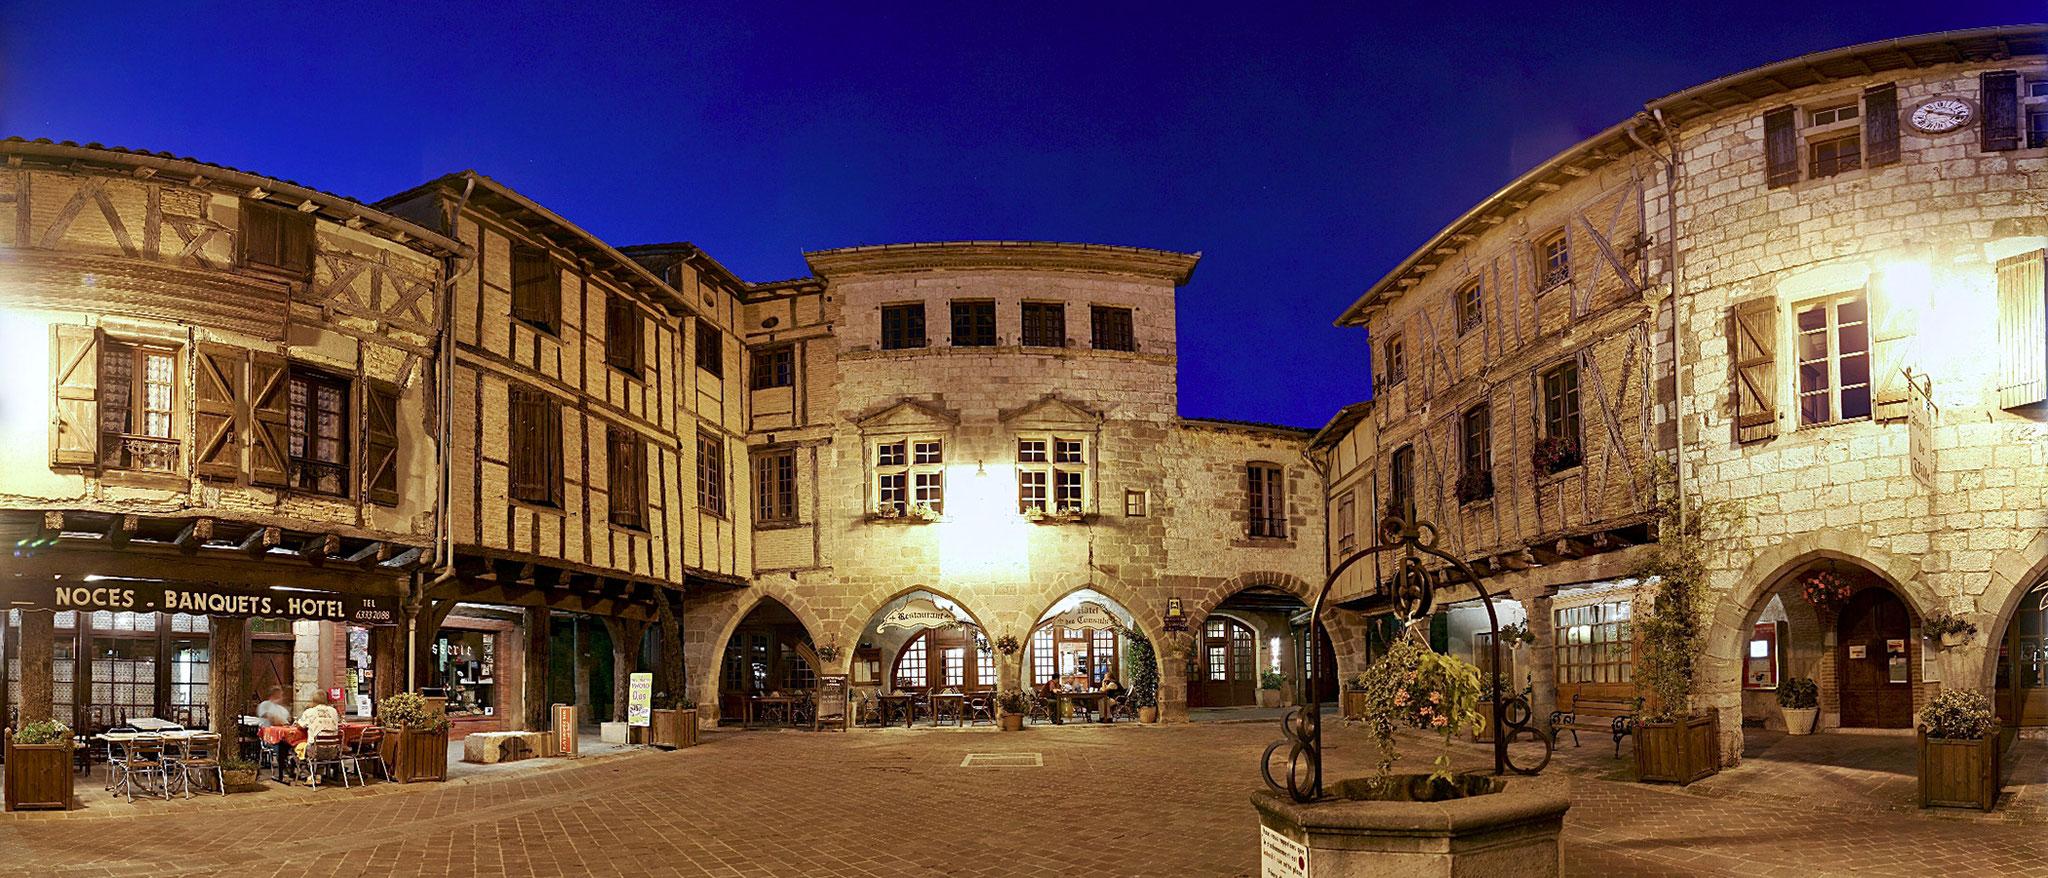 Castelno de Montirail